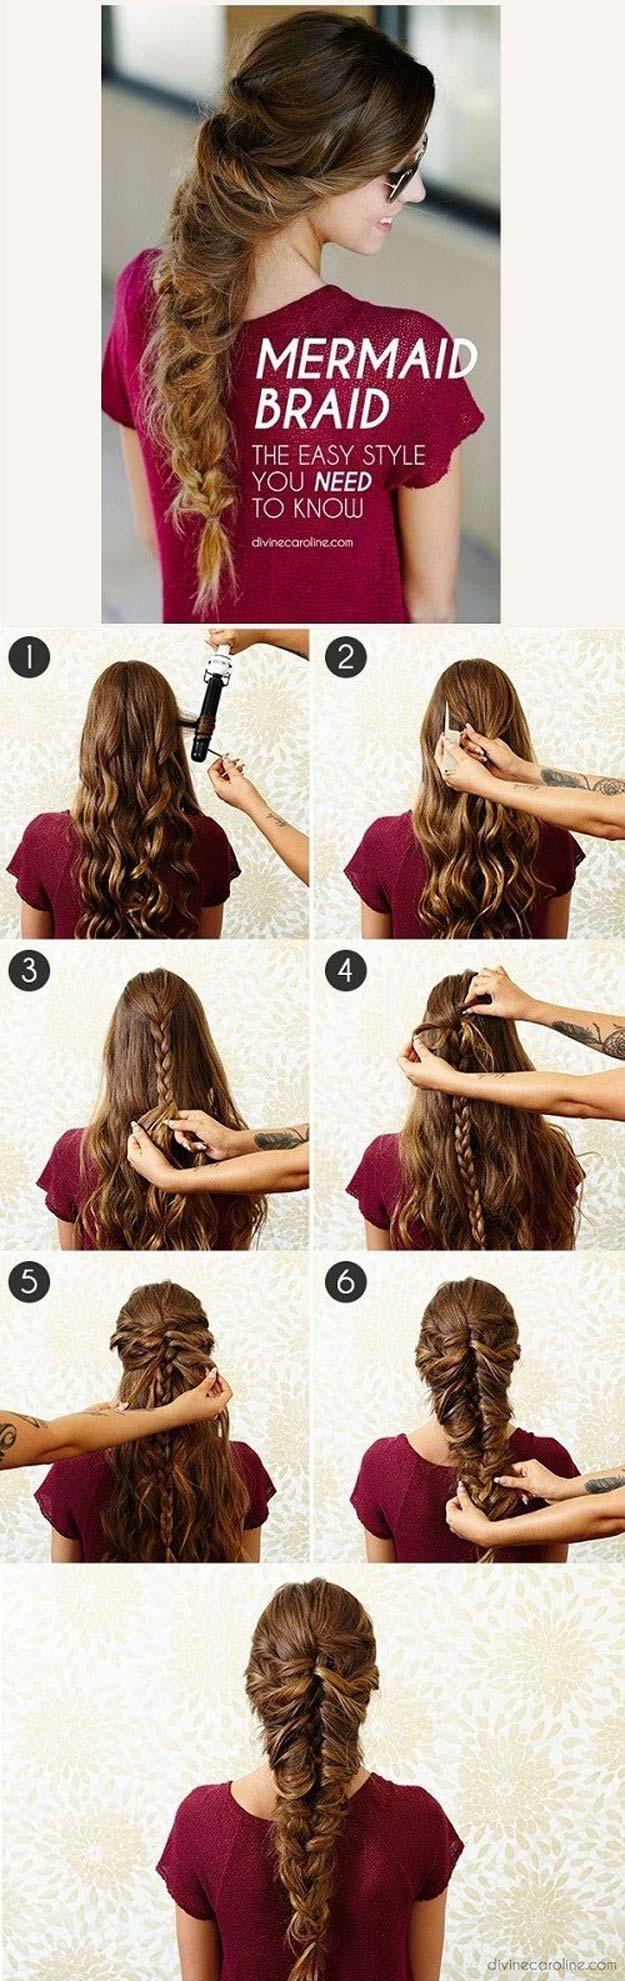 Best Hair Braiding Tutorials - Mermaid Braid - Easy Step by Step Tutorials for Braids - How To Braid Fishtail, French Braids, Flower Crown, Side Braids, Cornrows, Updos - Cool Braided Hairstyles for Girls, Teens and Women - School, Day and Evening, Boho, Casual and Formal Looks #hairstyles #braiding #braidingtutorials #diyhair